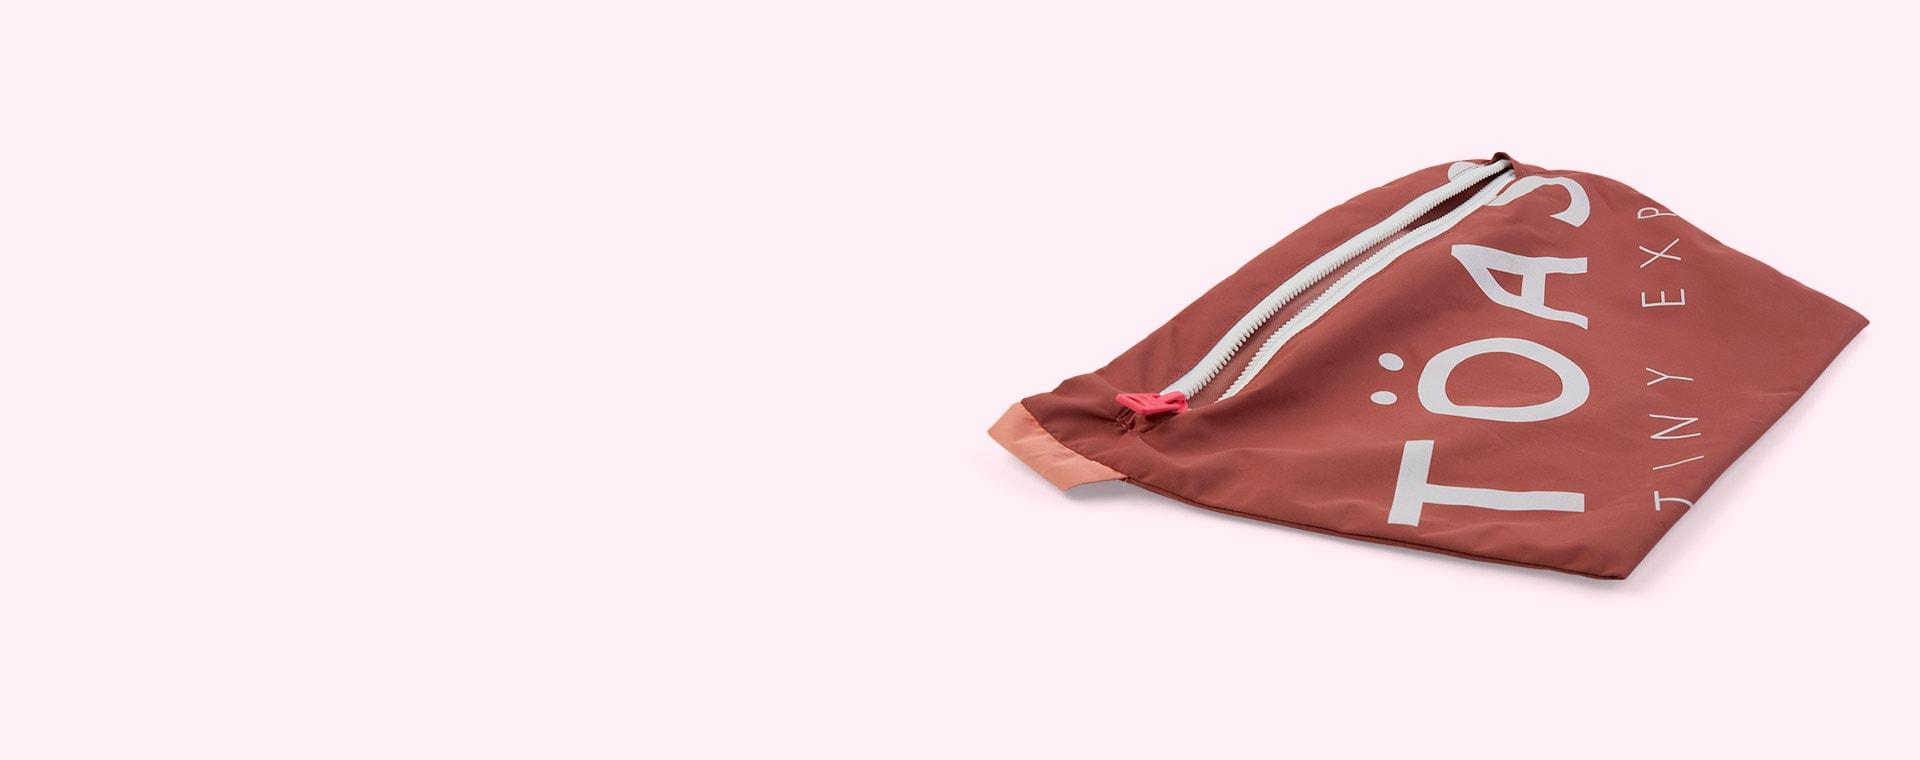 Rose Pink / Peach Töastie Kids FeatherLite Pac-a-Mac